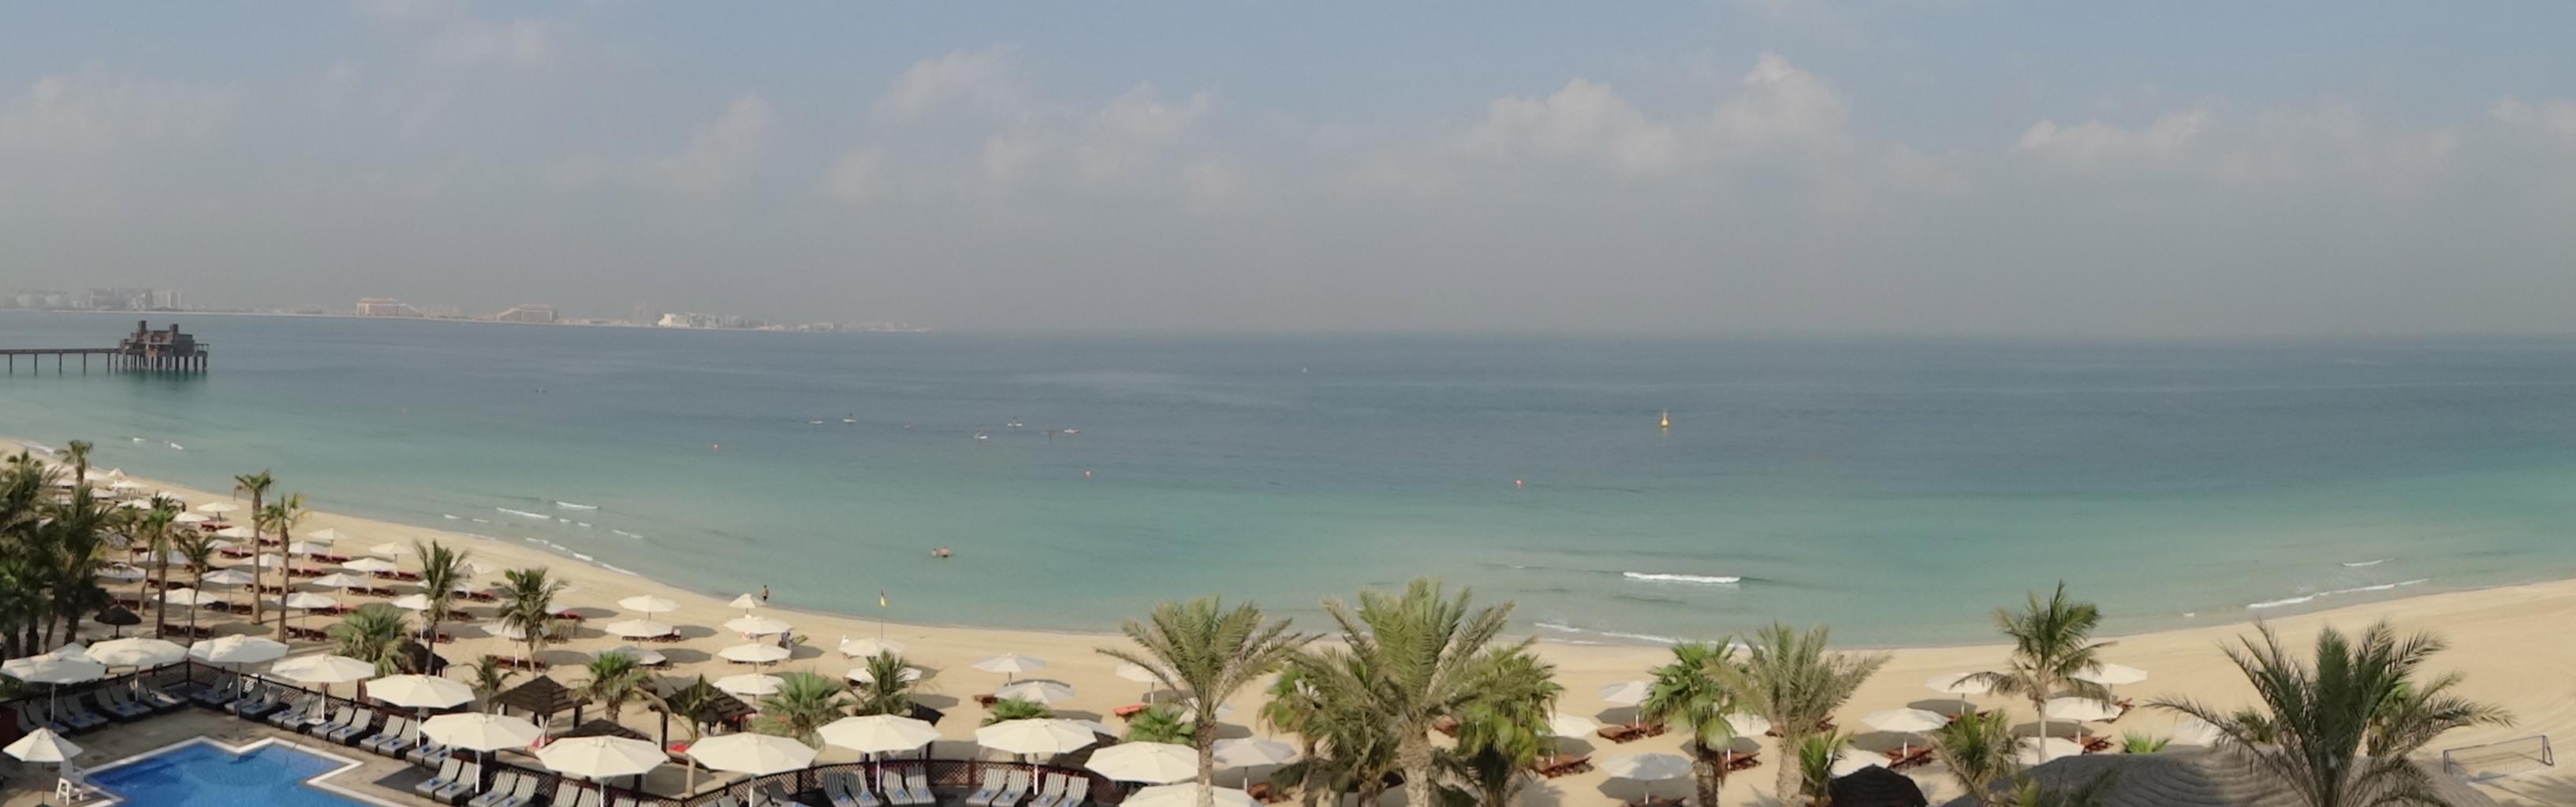 DSC01130 Dubai5 HappyFace313